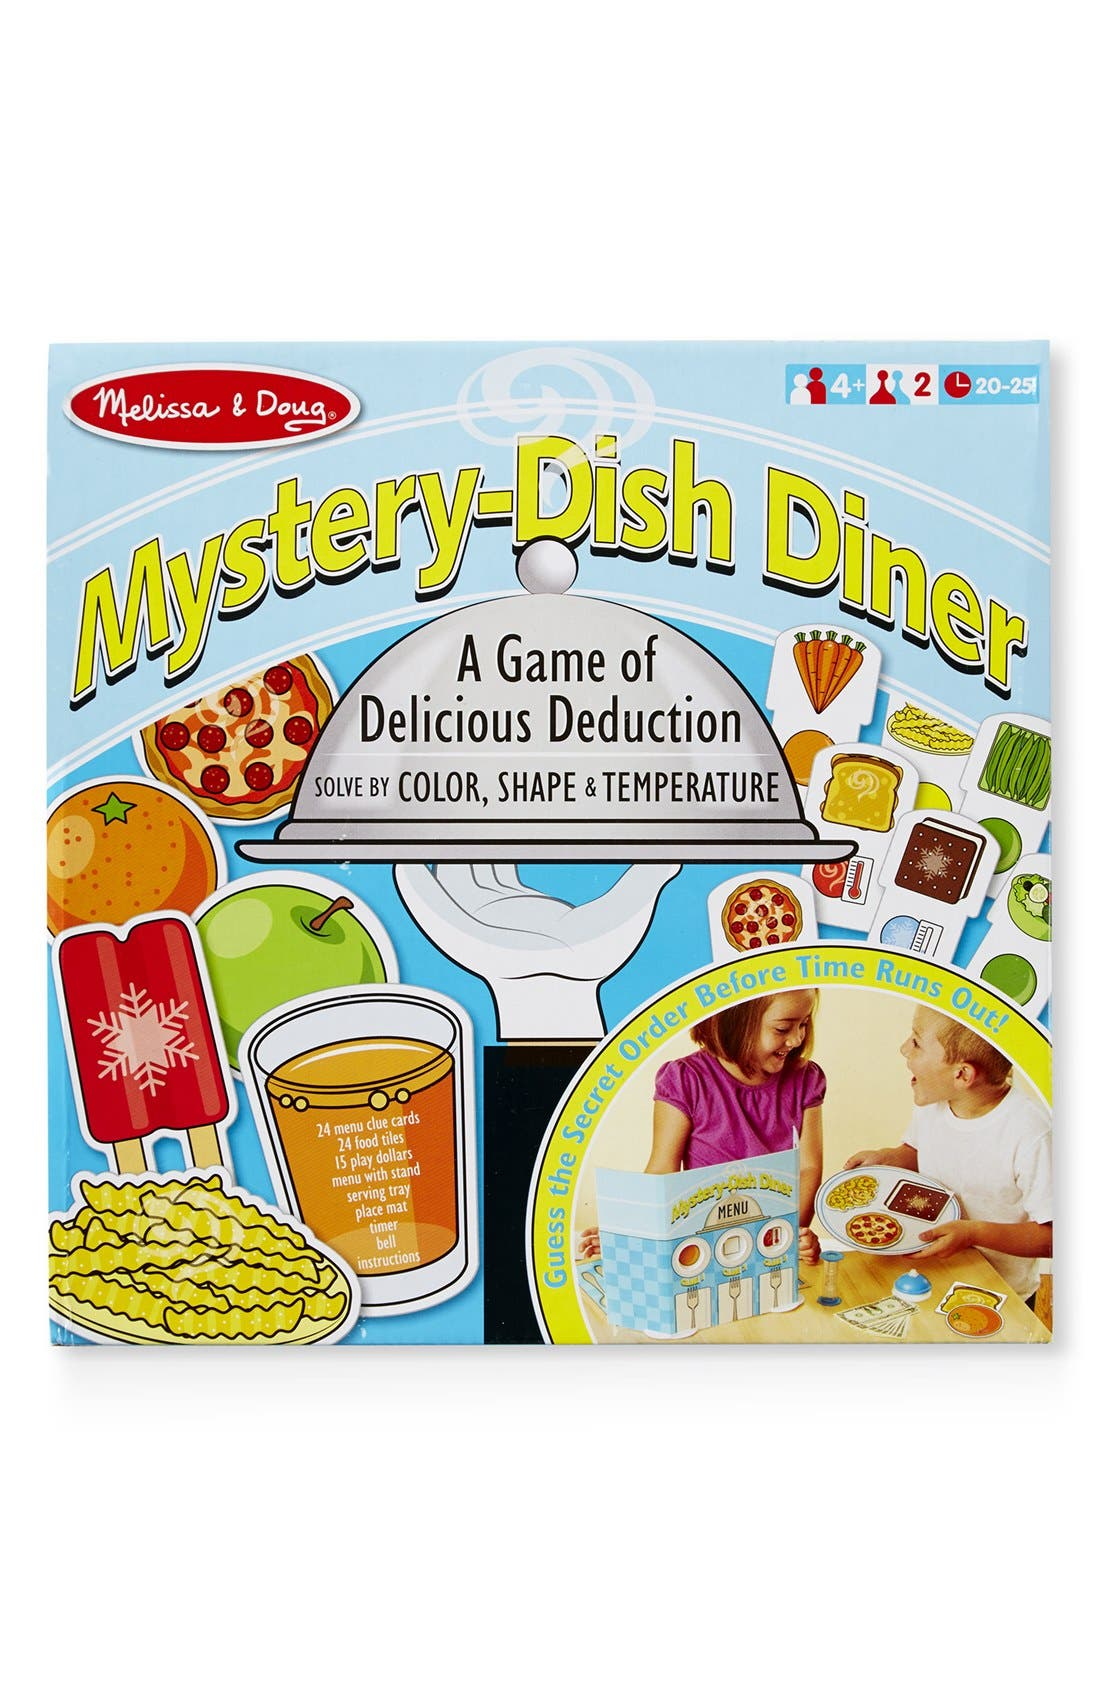 Melissa & Doug 'Mystery Dish Diner' Game